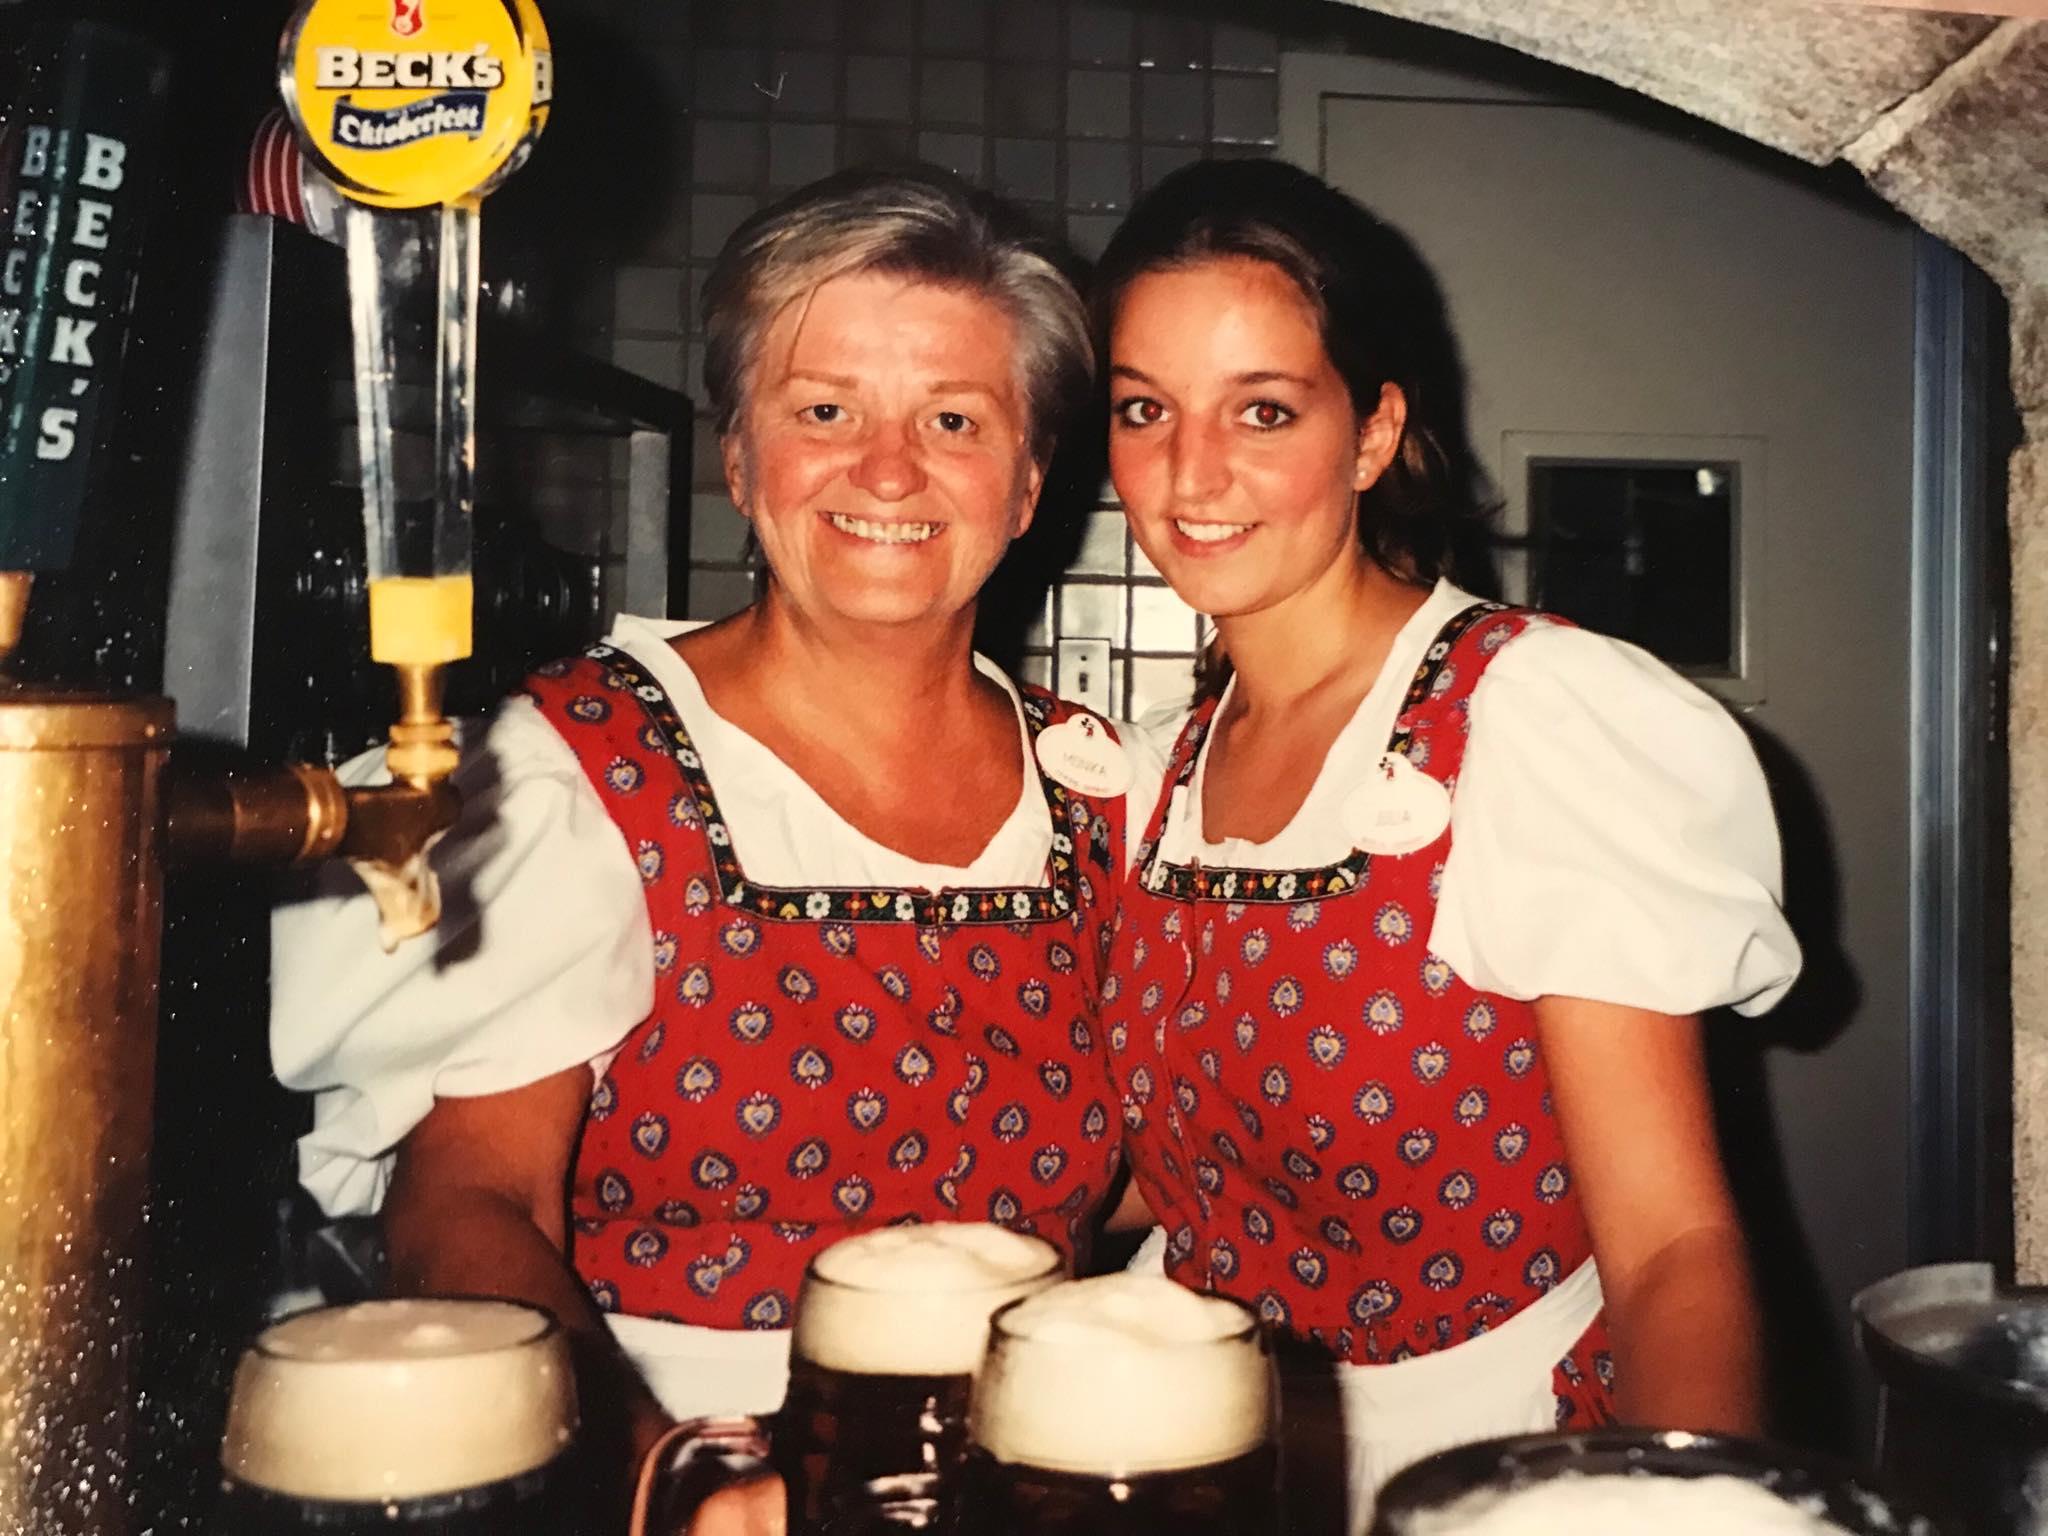 Julia (right) in her finest German threads